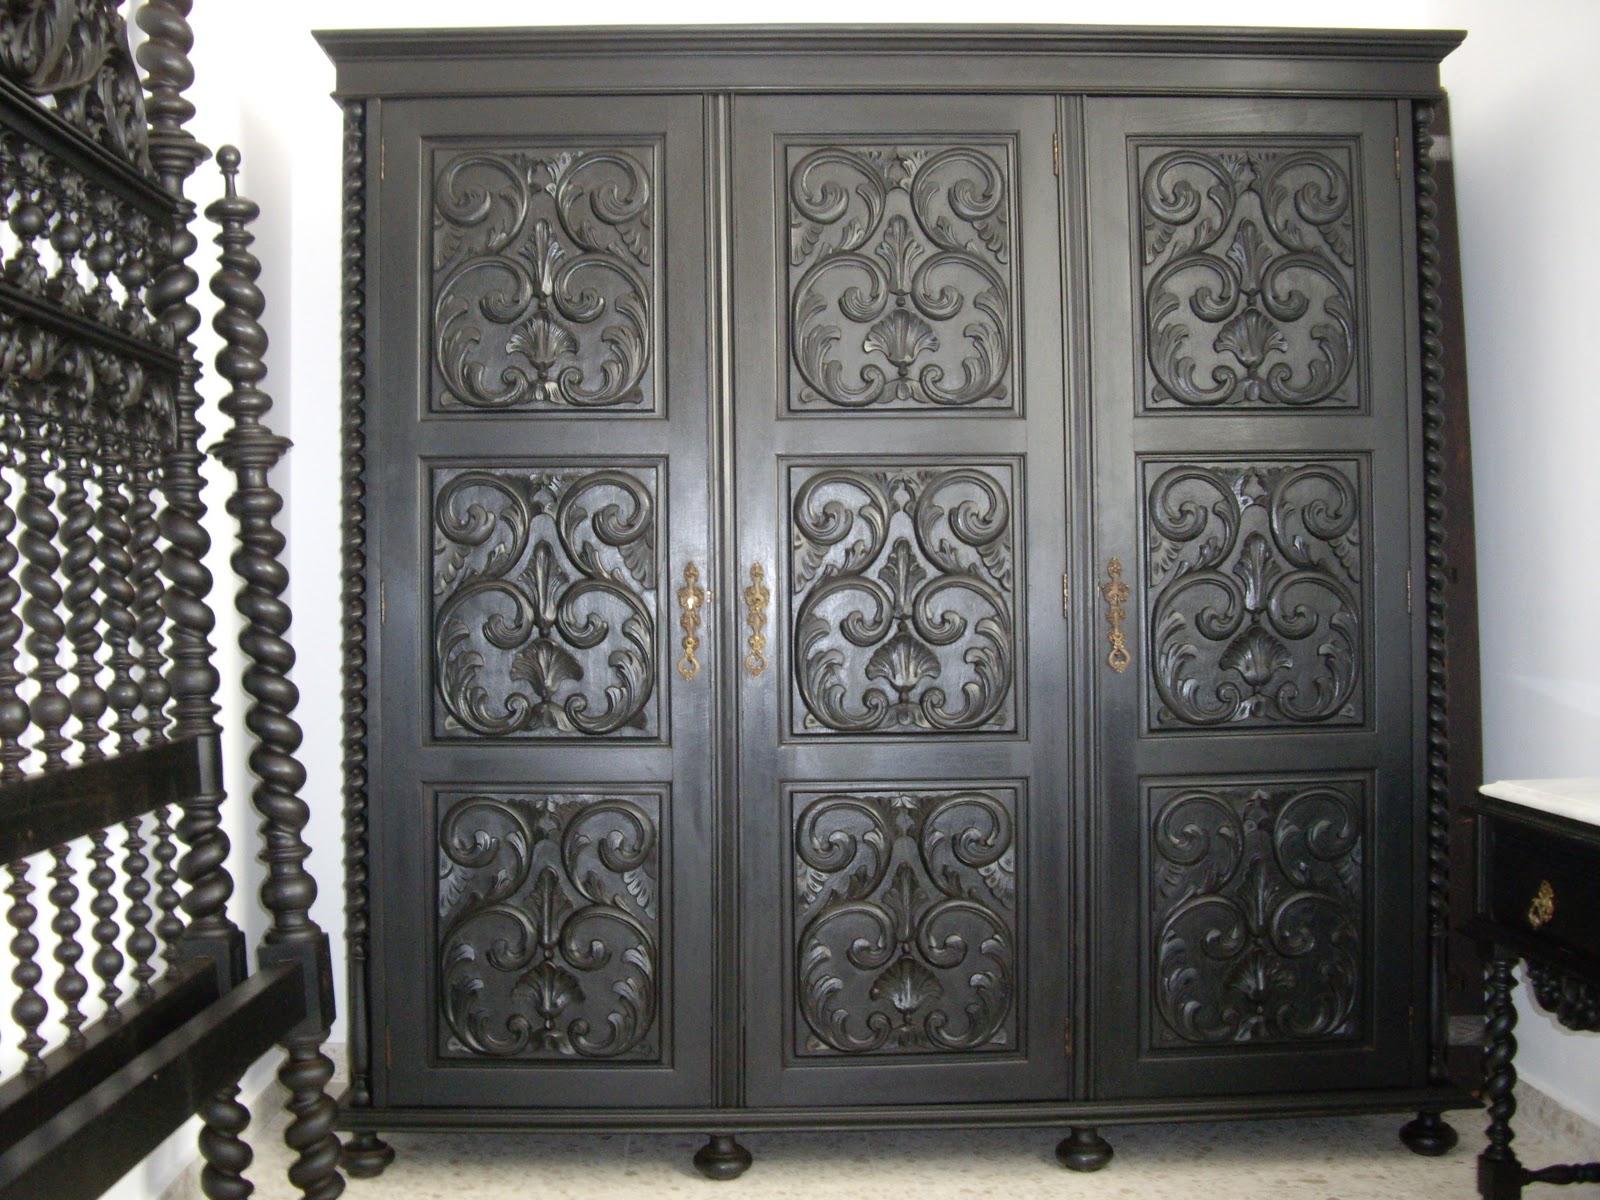 Antiguedades dormitorio de caoba negra - Muebles antiguos sevilla ...